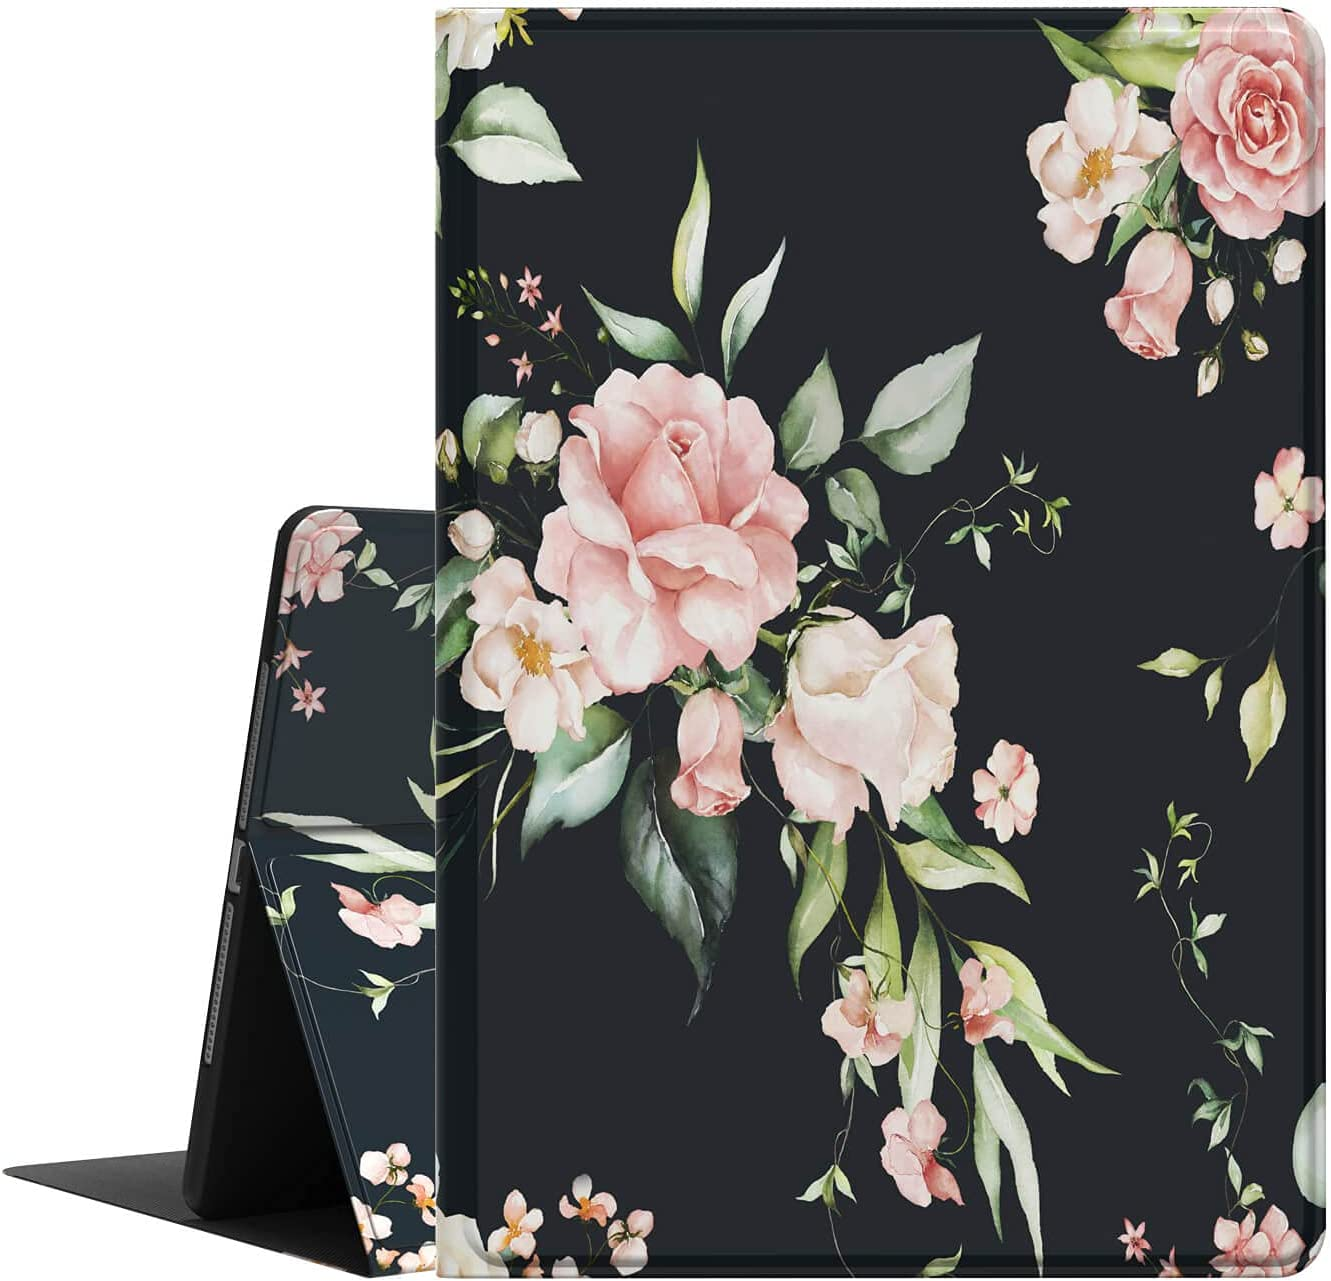 iPad Mini 5 Case, iPad Mini 4 Case, Feams PU Leather Shockproof Shell Stand Smart Cover with Auto Wake/Sleep for iPad Mini 5th Gen 2019/iPad Mini 4 2015 7.9 inch Tablet, Rose